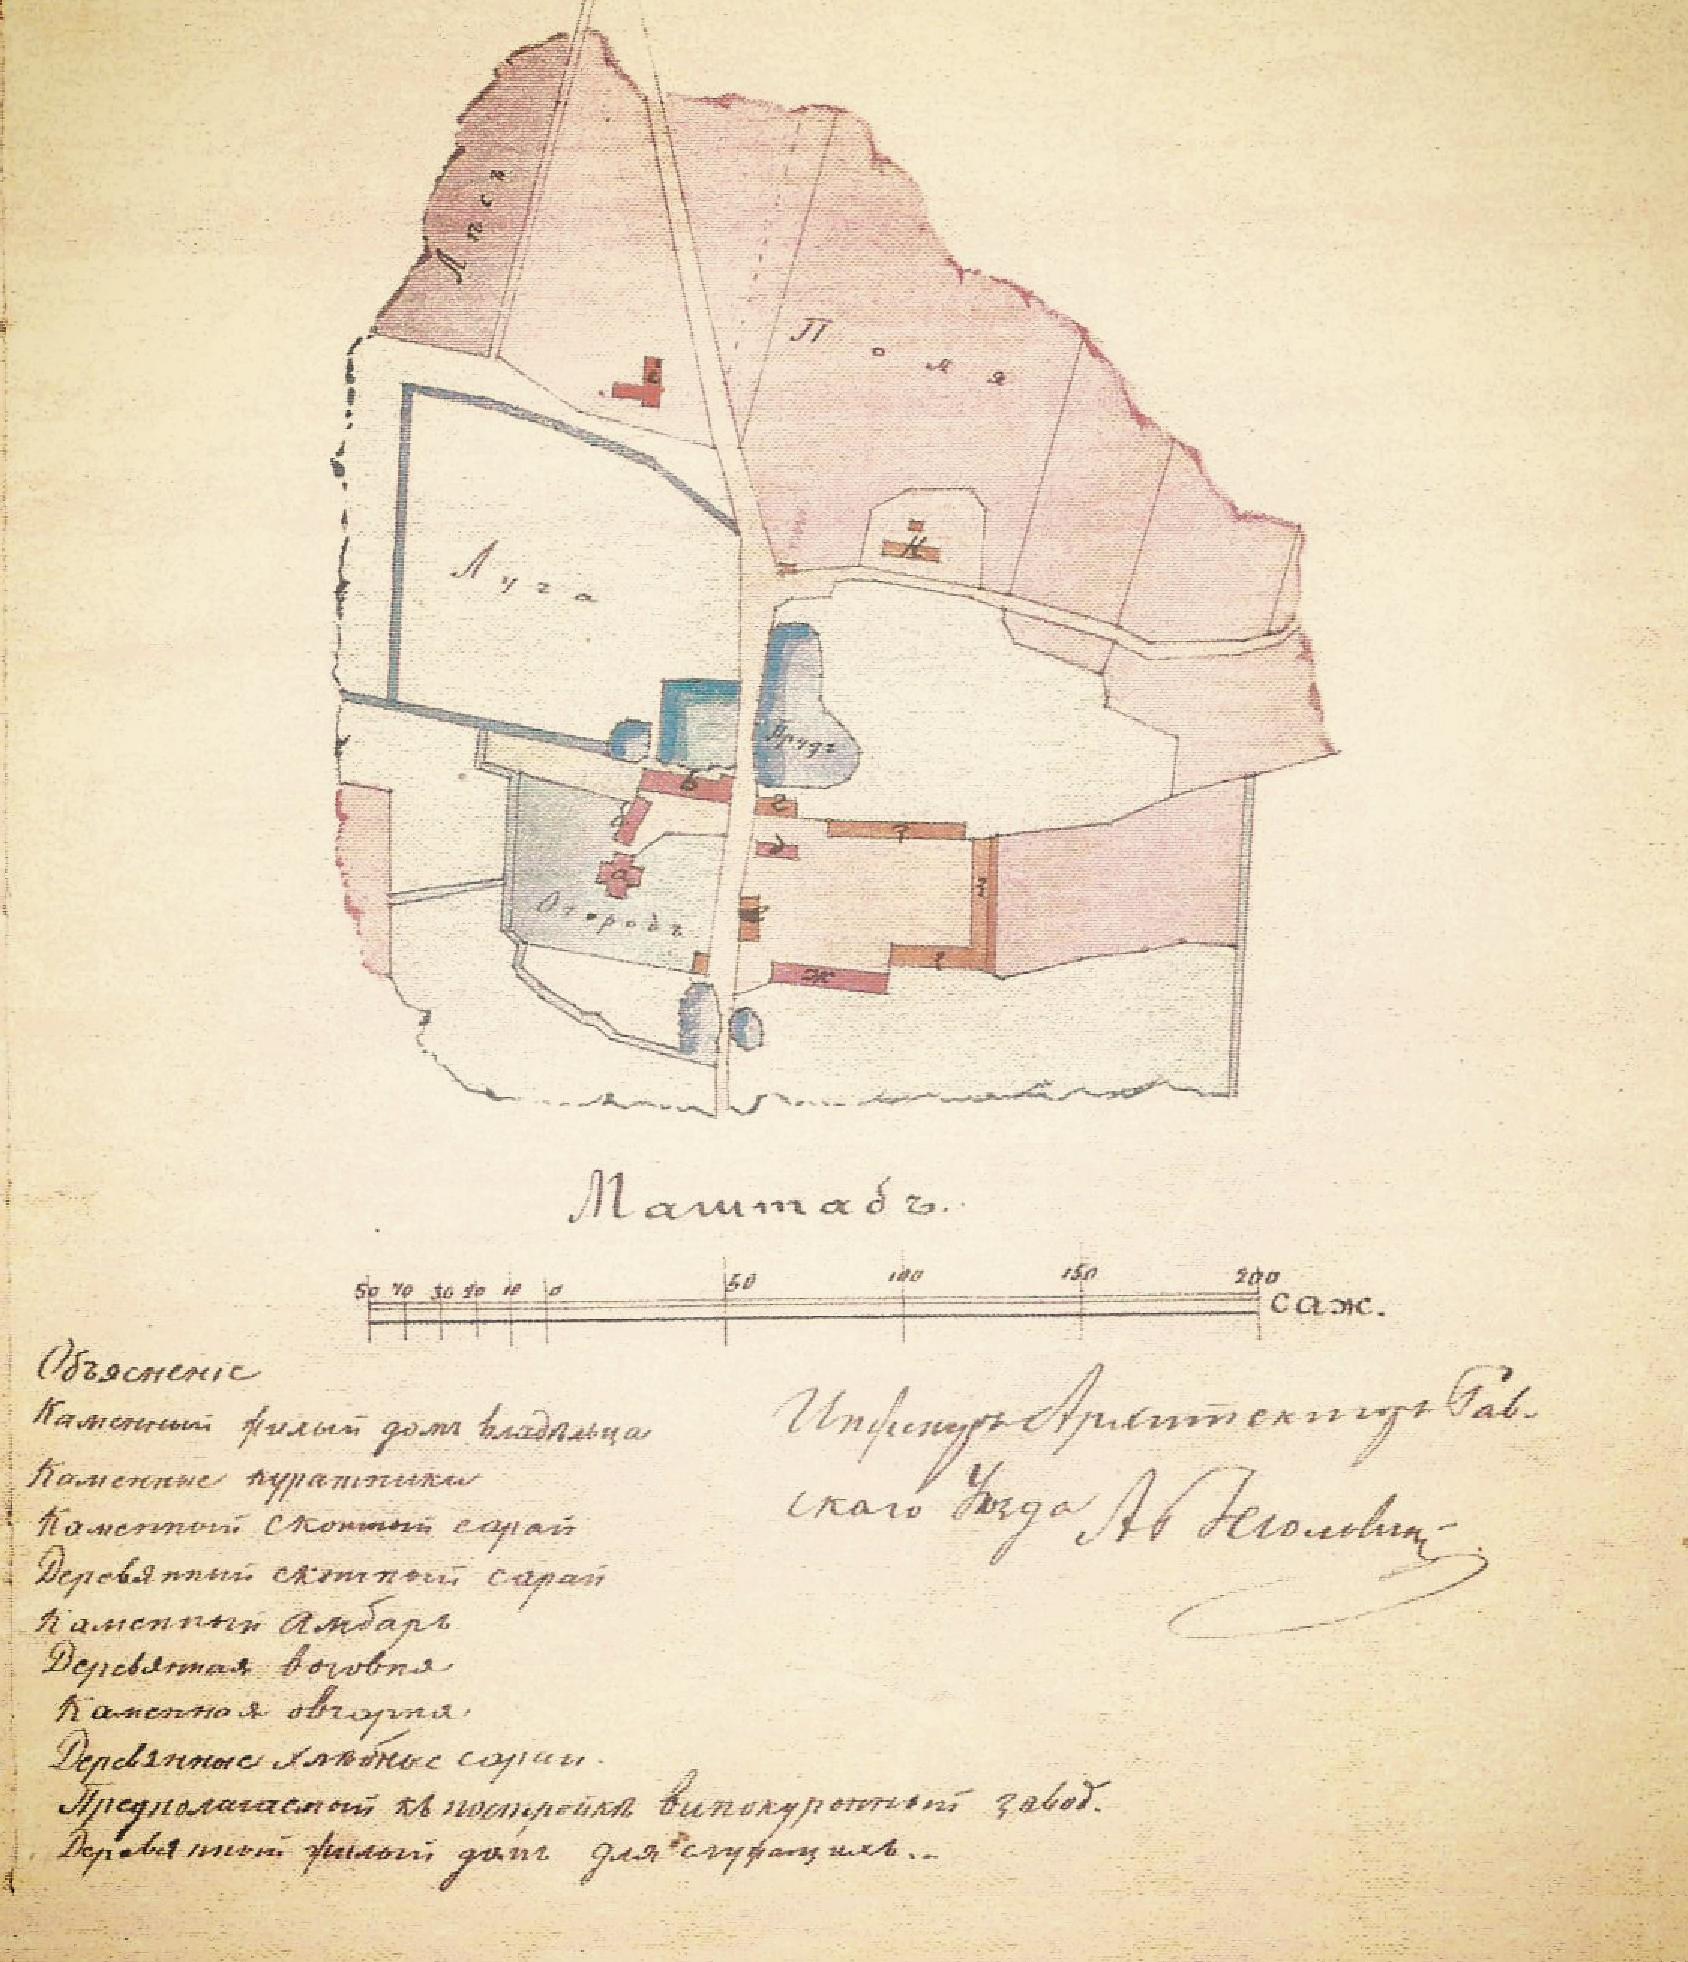 1850 - Leonard Wilski devises the grand plan for Wilkowice